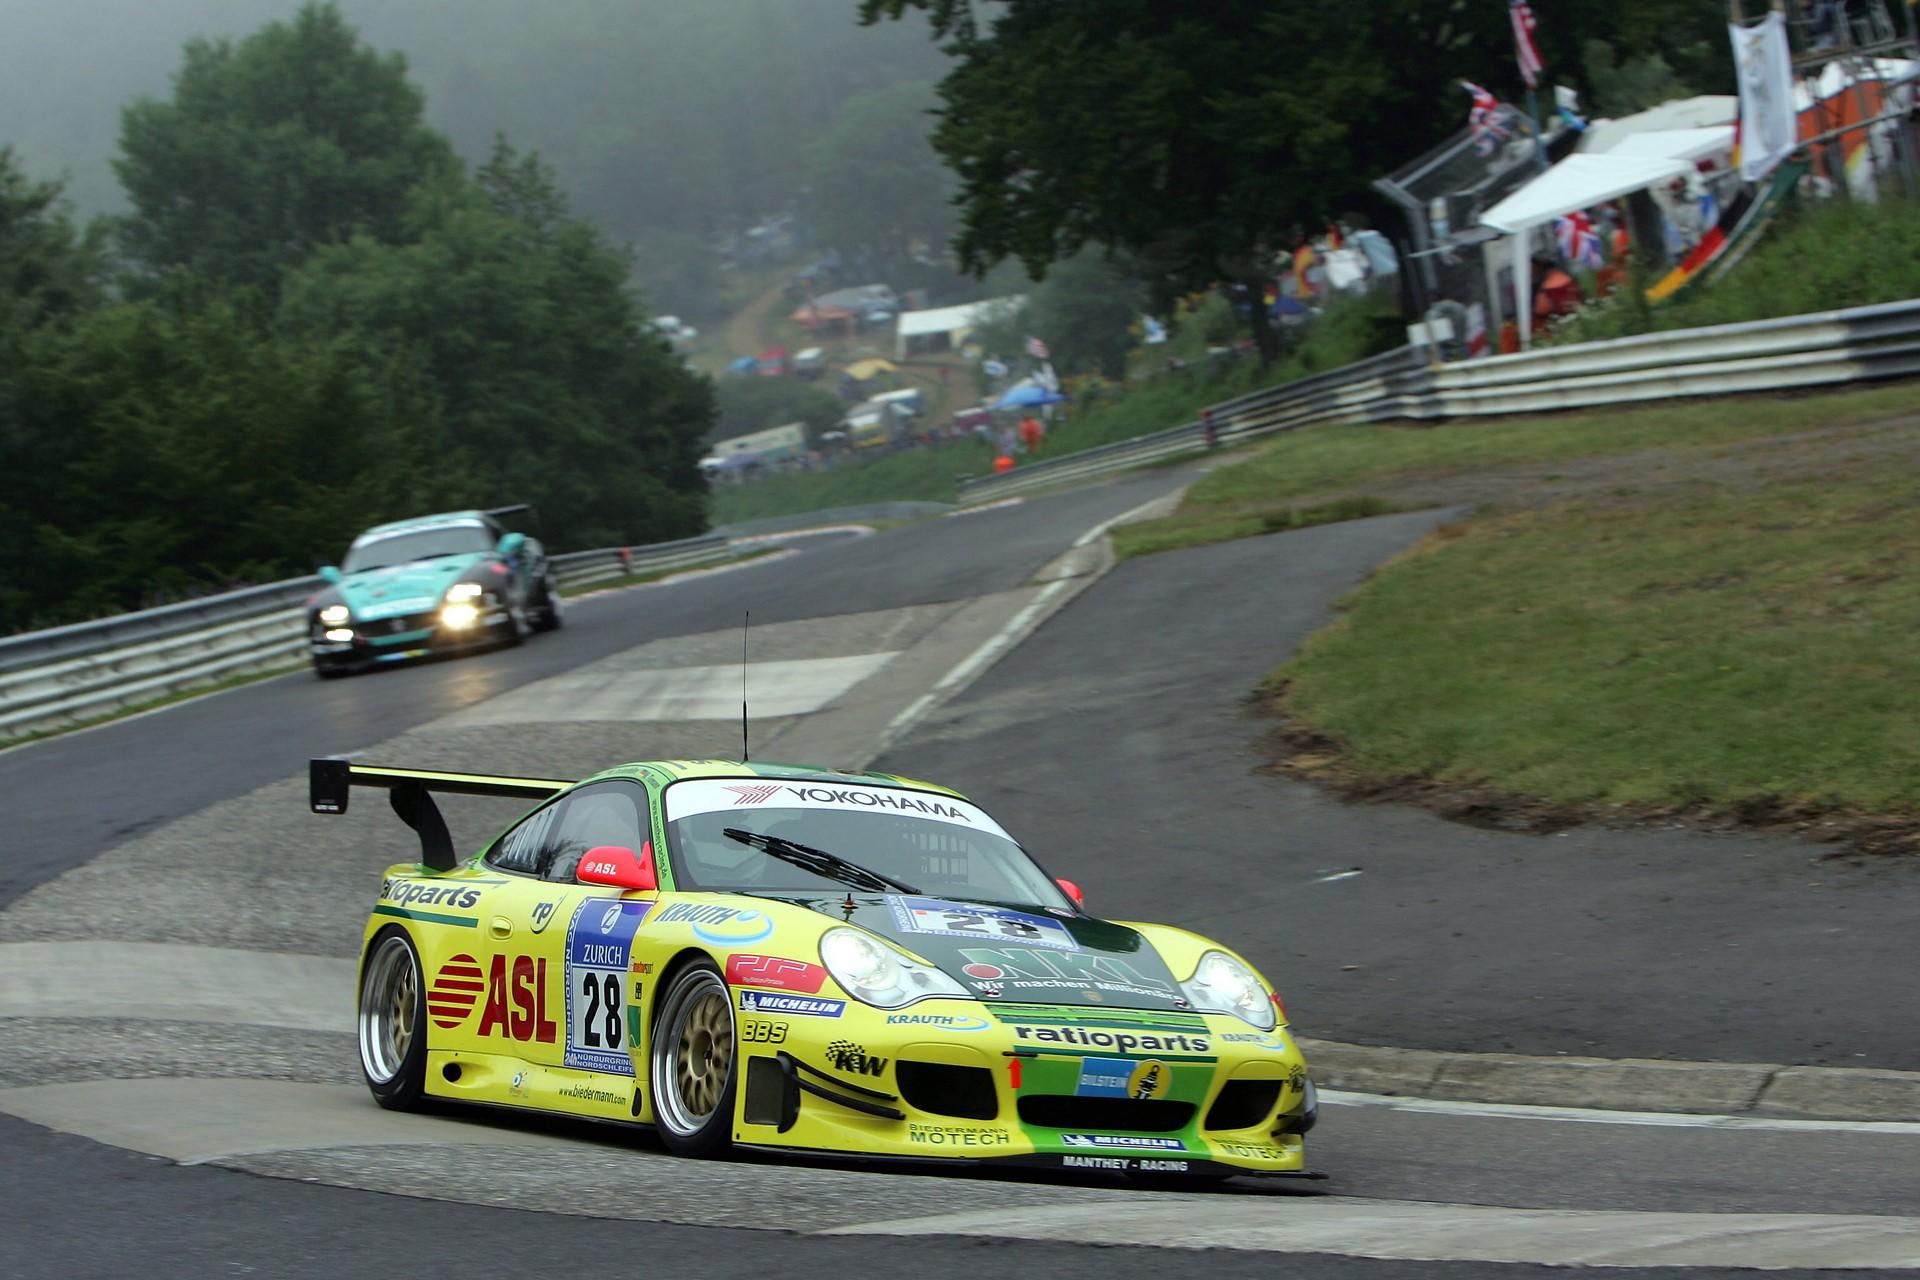 20-years-of-the-Porsche-911-GT3-56